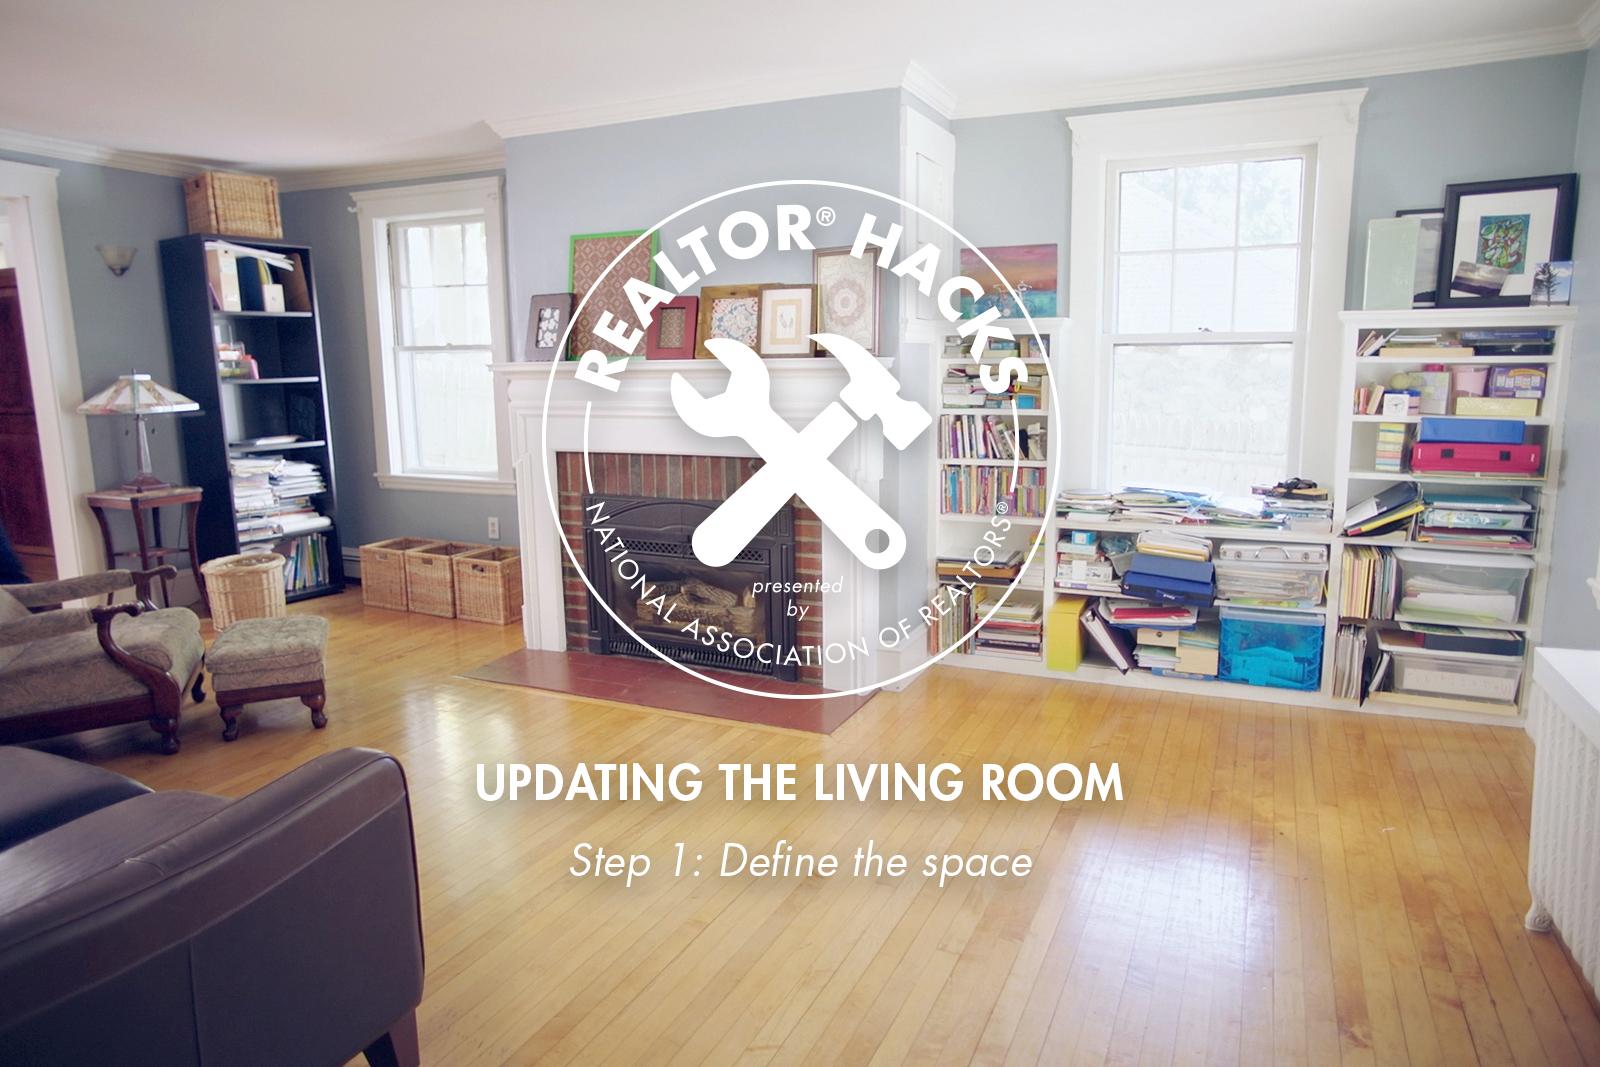 Realtor® Hacks: Updating the Living Room, Step 1